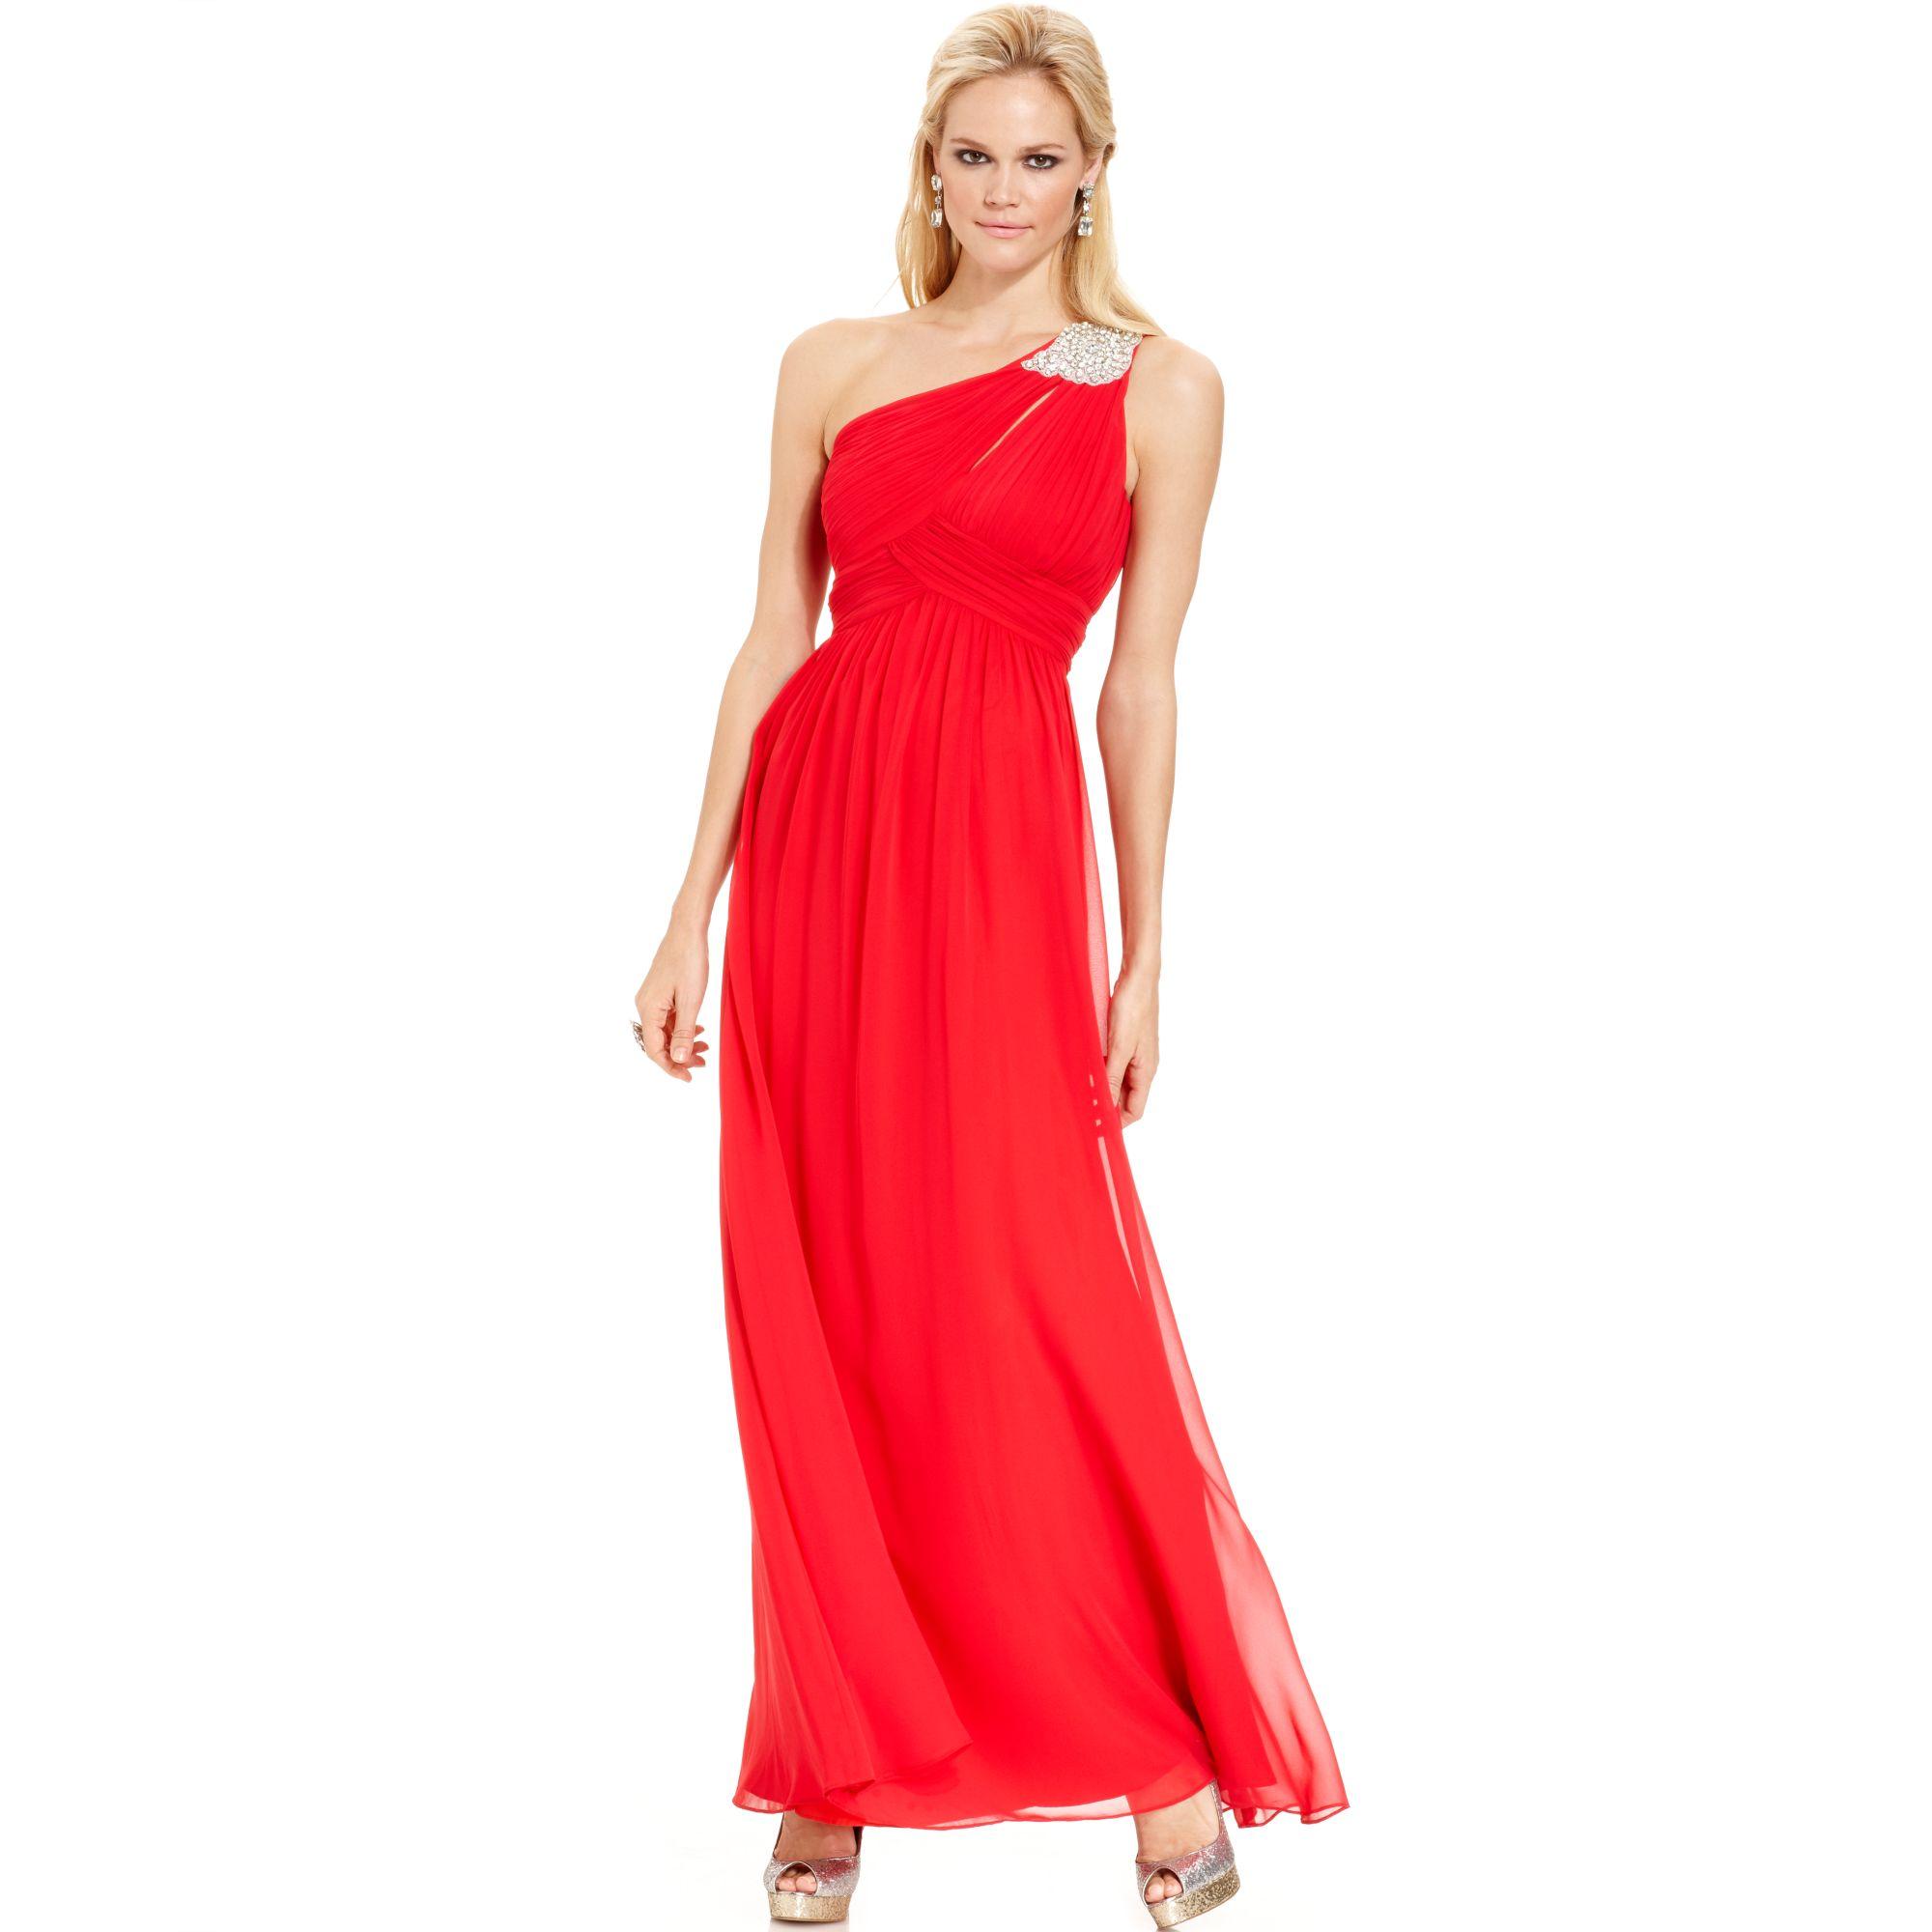 Lyst - Calvin Klein One Shoulder Jewel Brooch Gown in Red